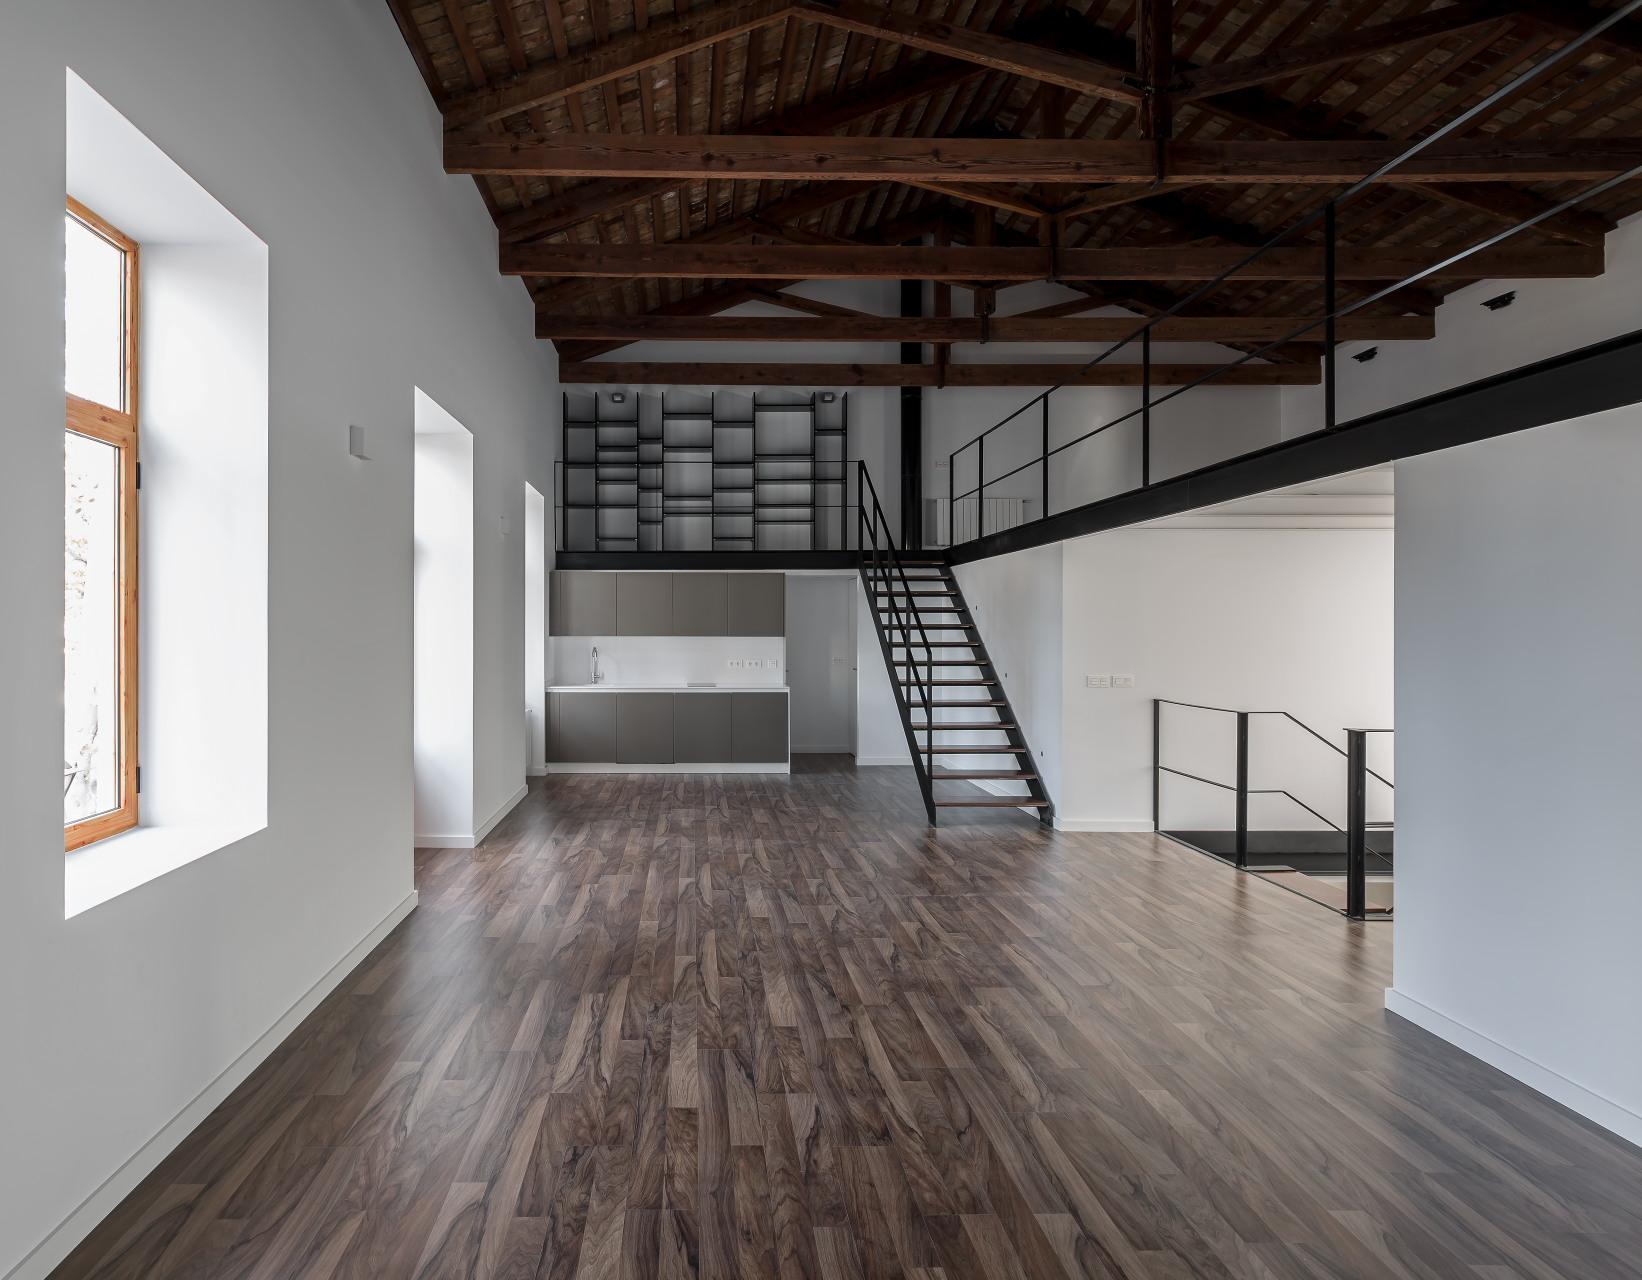 fotografia-arquitectura-valencia-german-cabo-viraje-rehabilitacion-campanar (17)